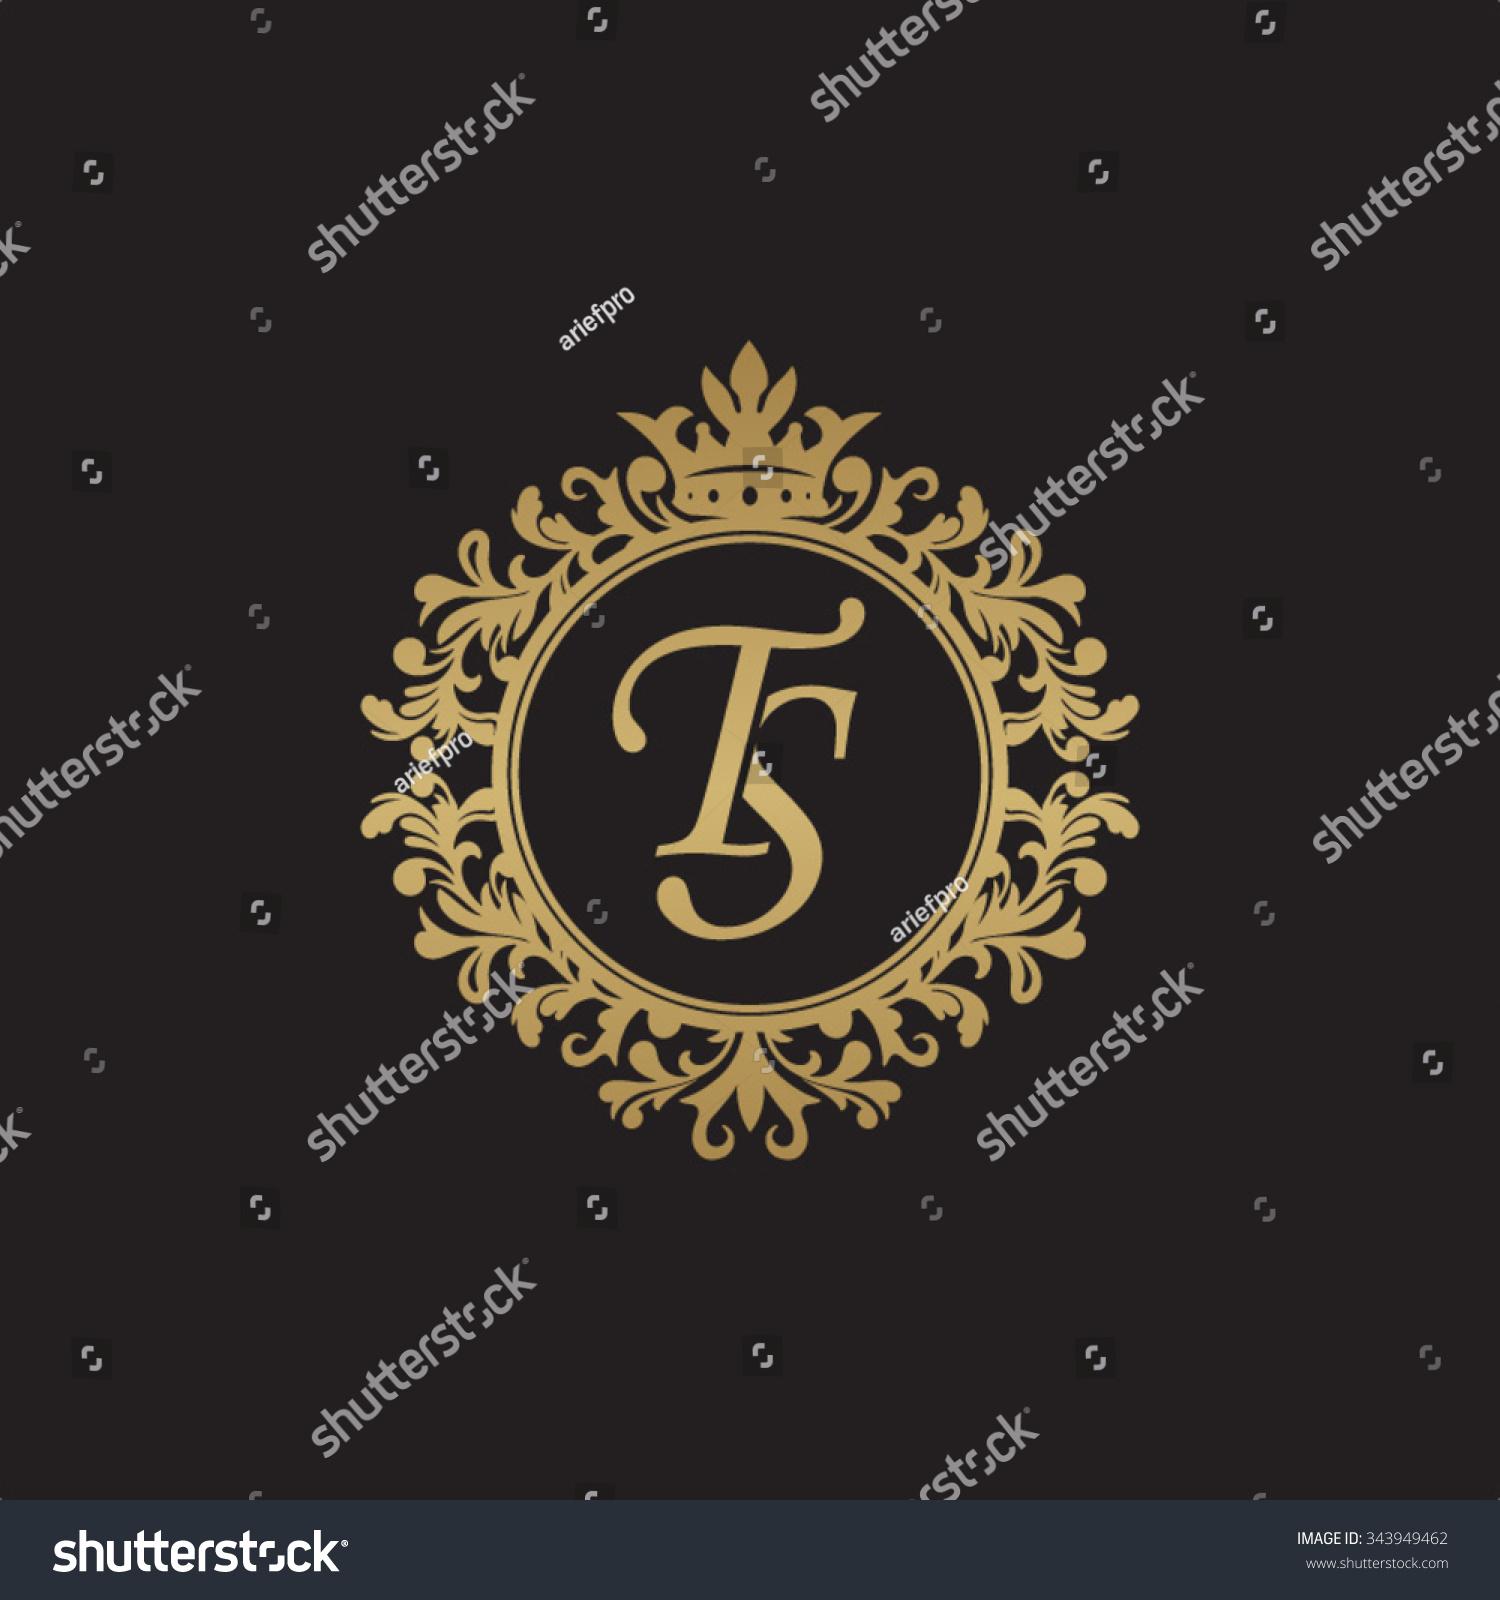 Tj initial luxury ornament monogram logo stock vector - Ts Initial Luxury Ornament Monogram Logo